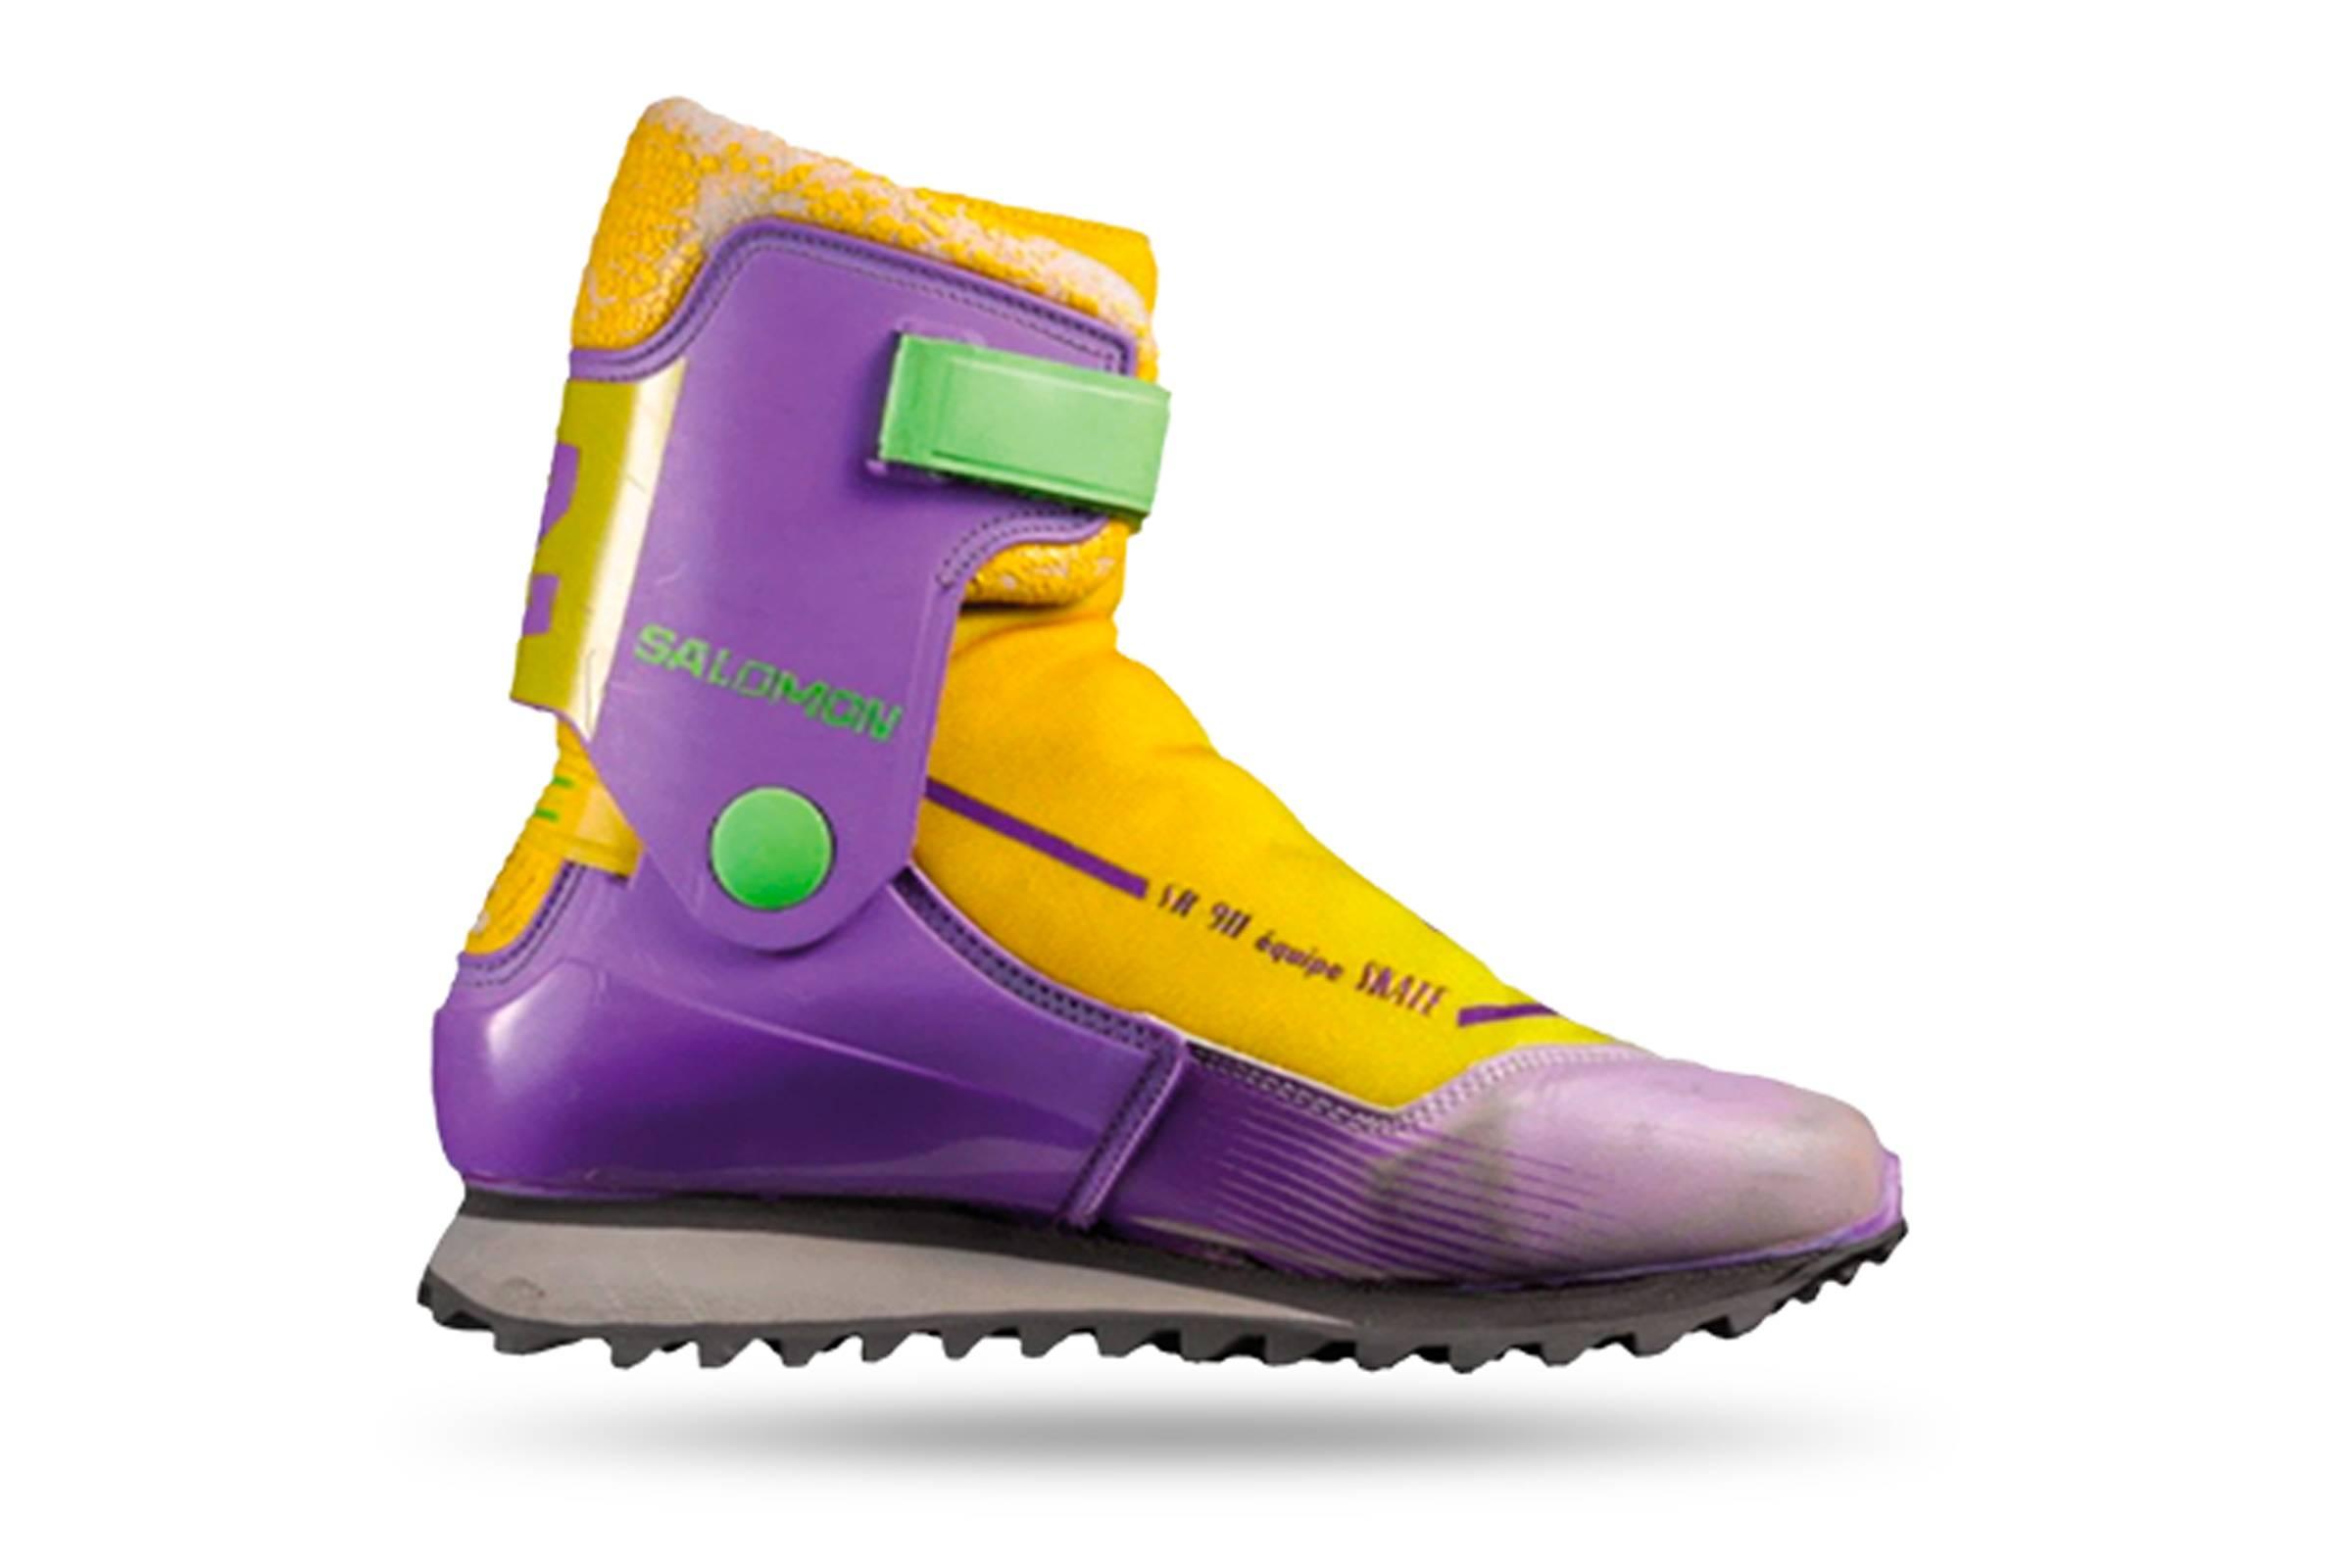 Salomon Hiking Boot (1992)